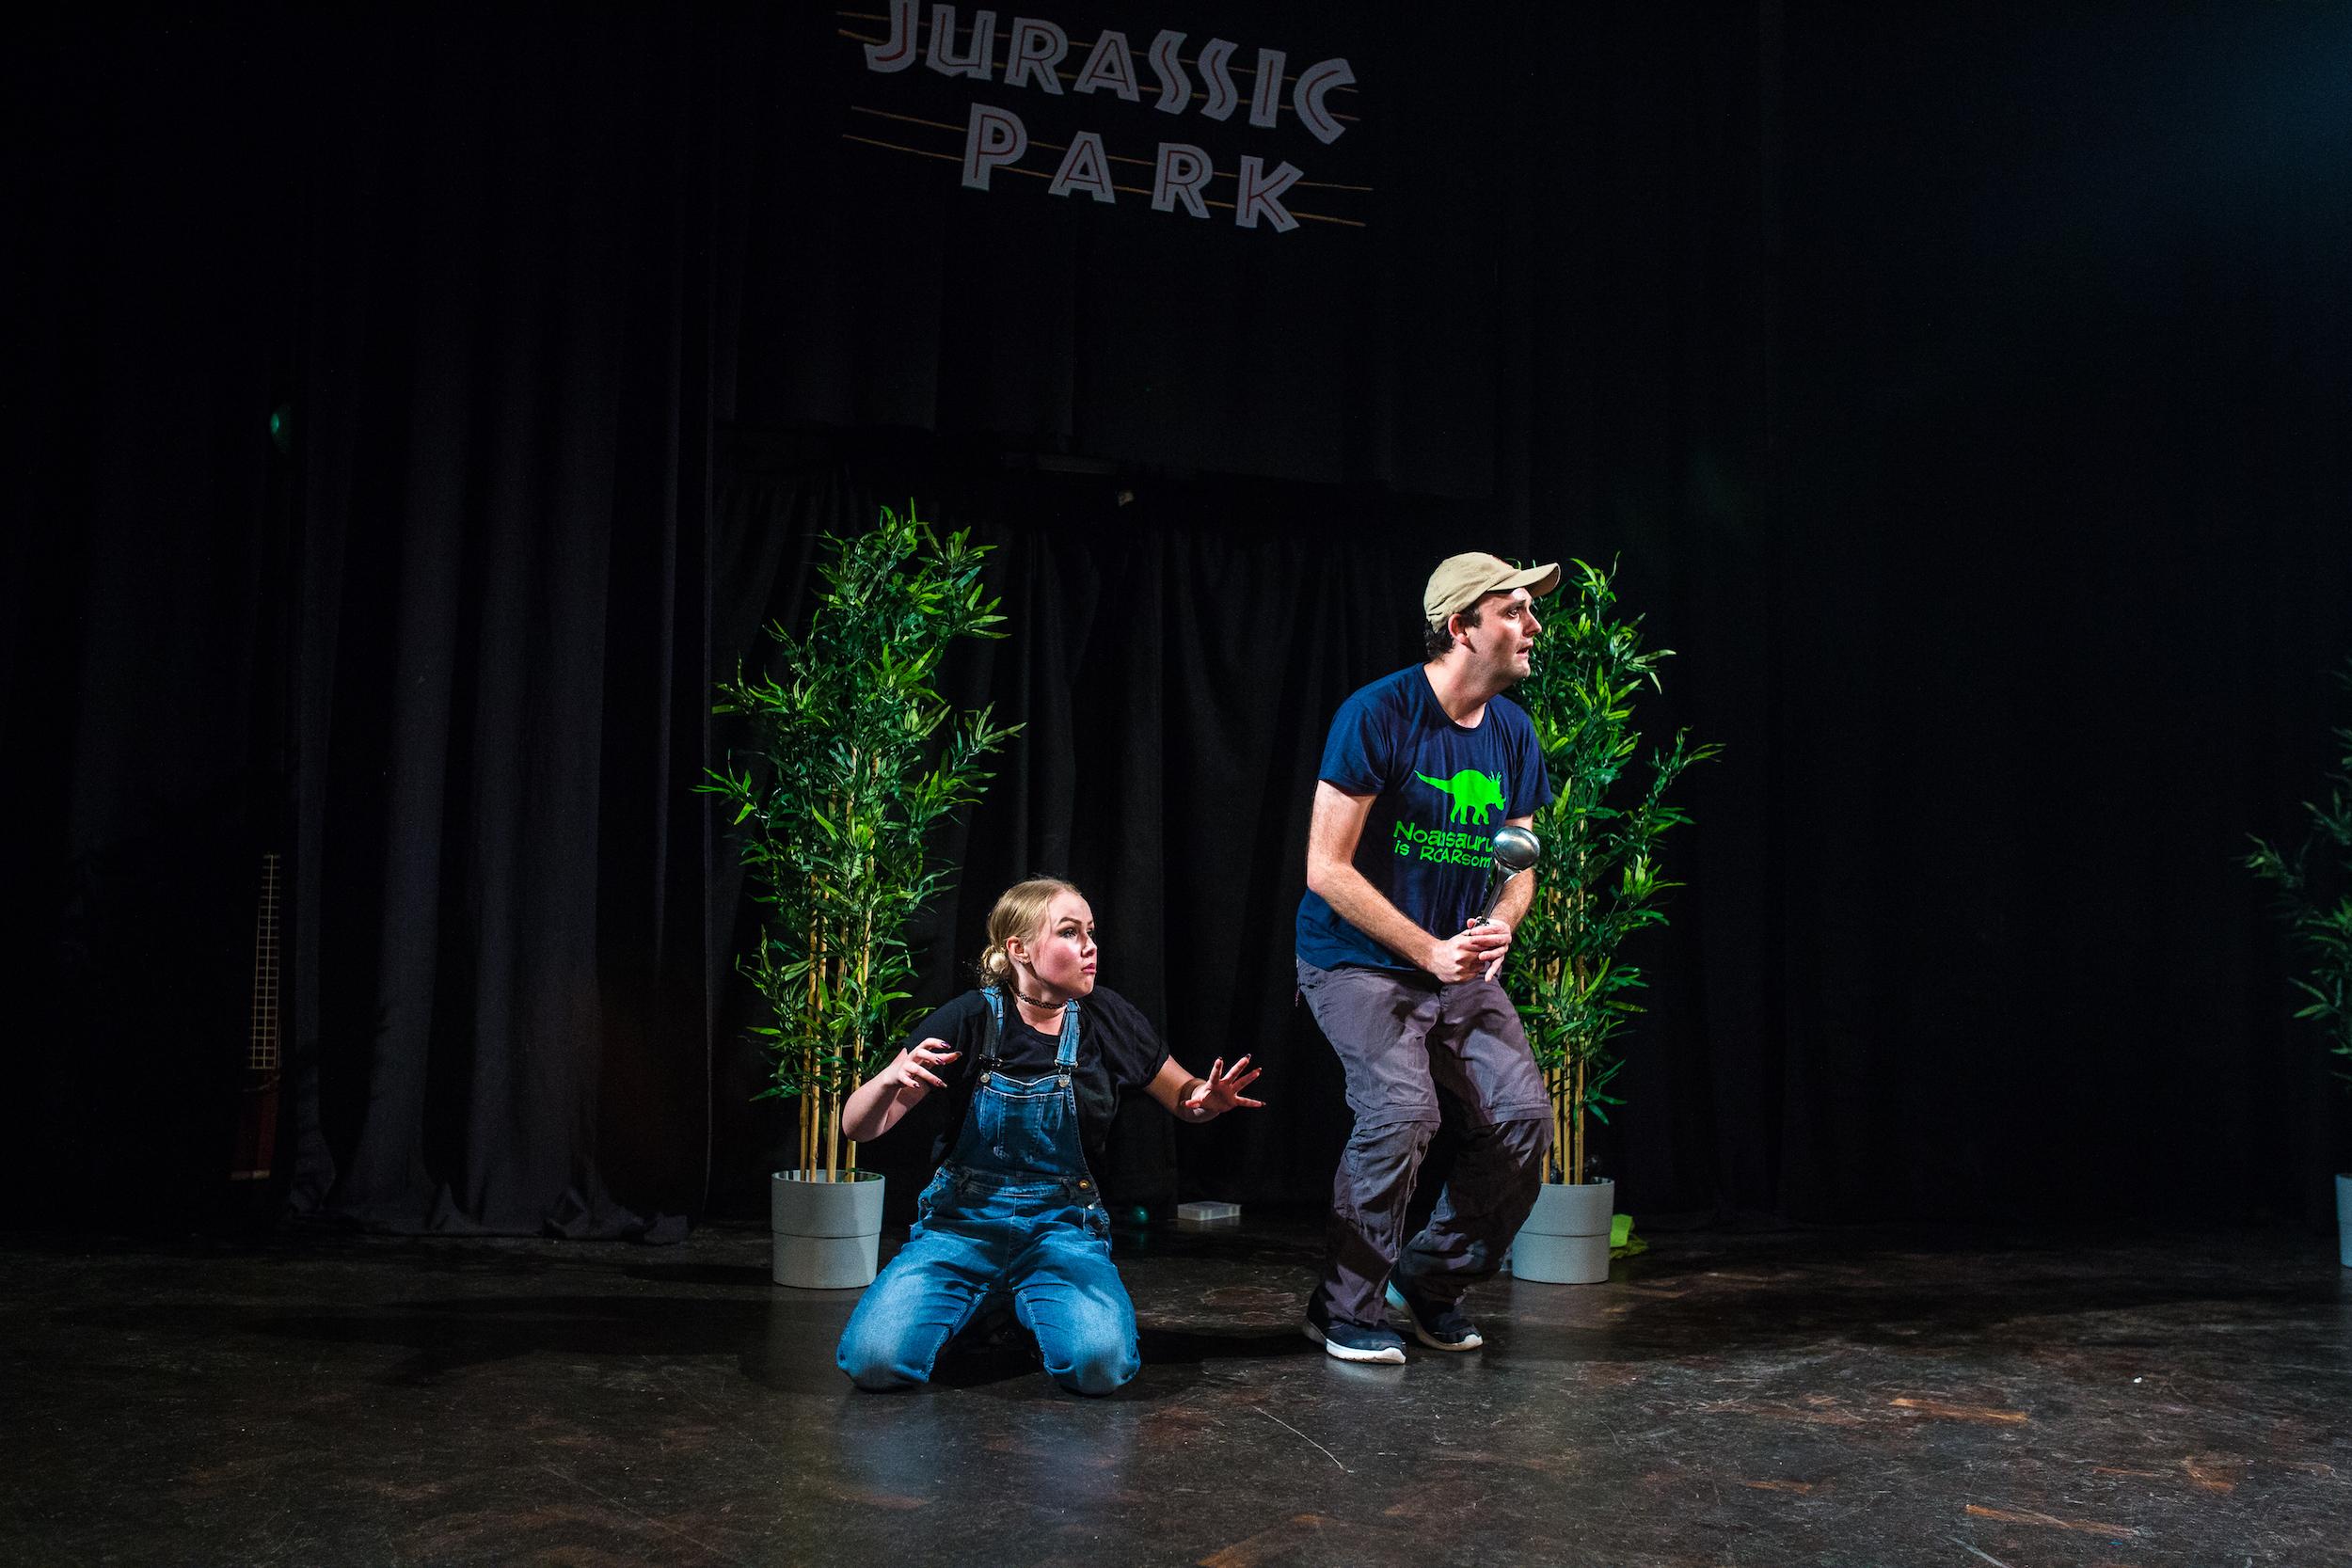 Jurassic Website 217.jpg